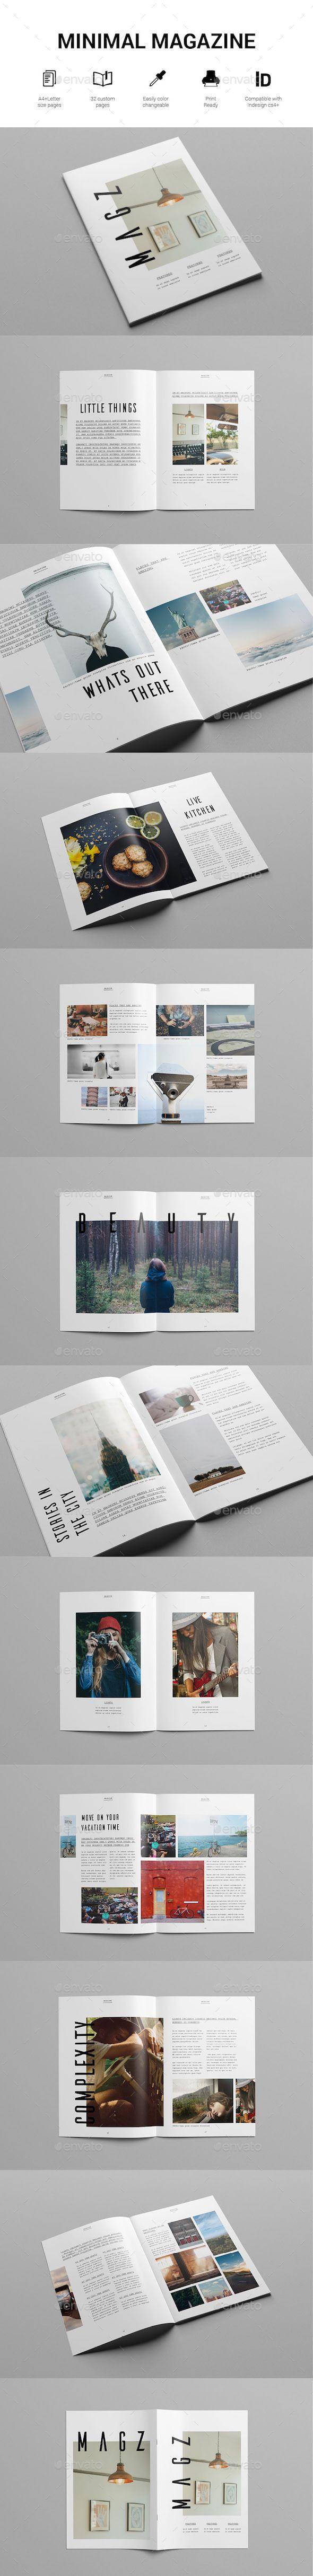 magazine template download